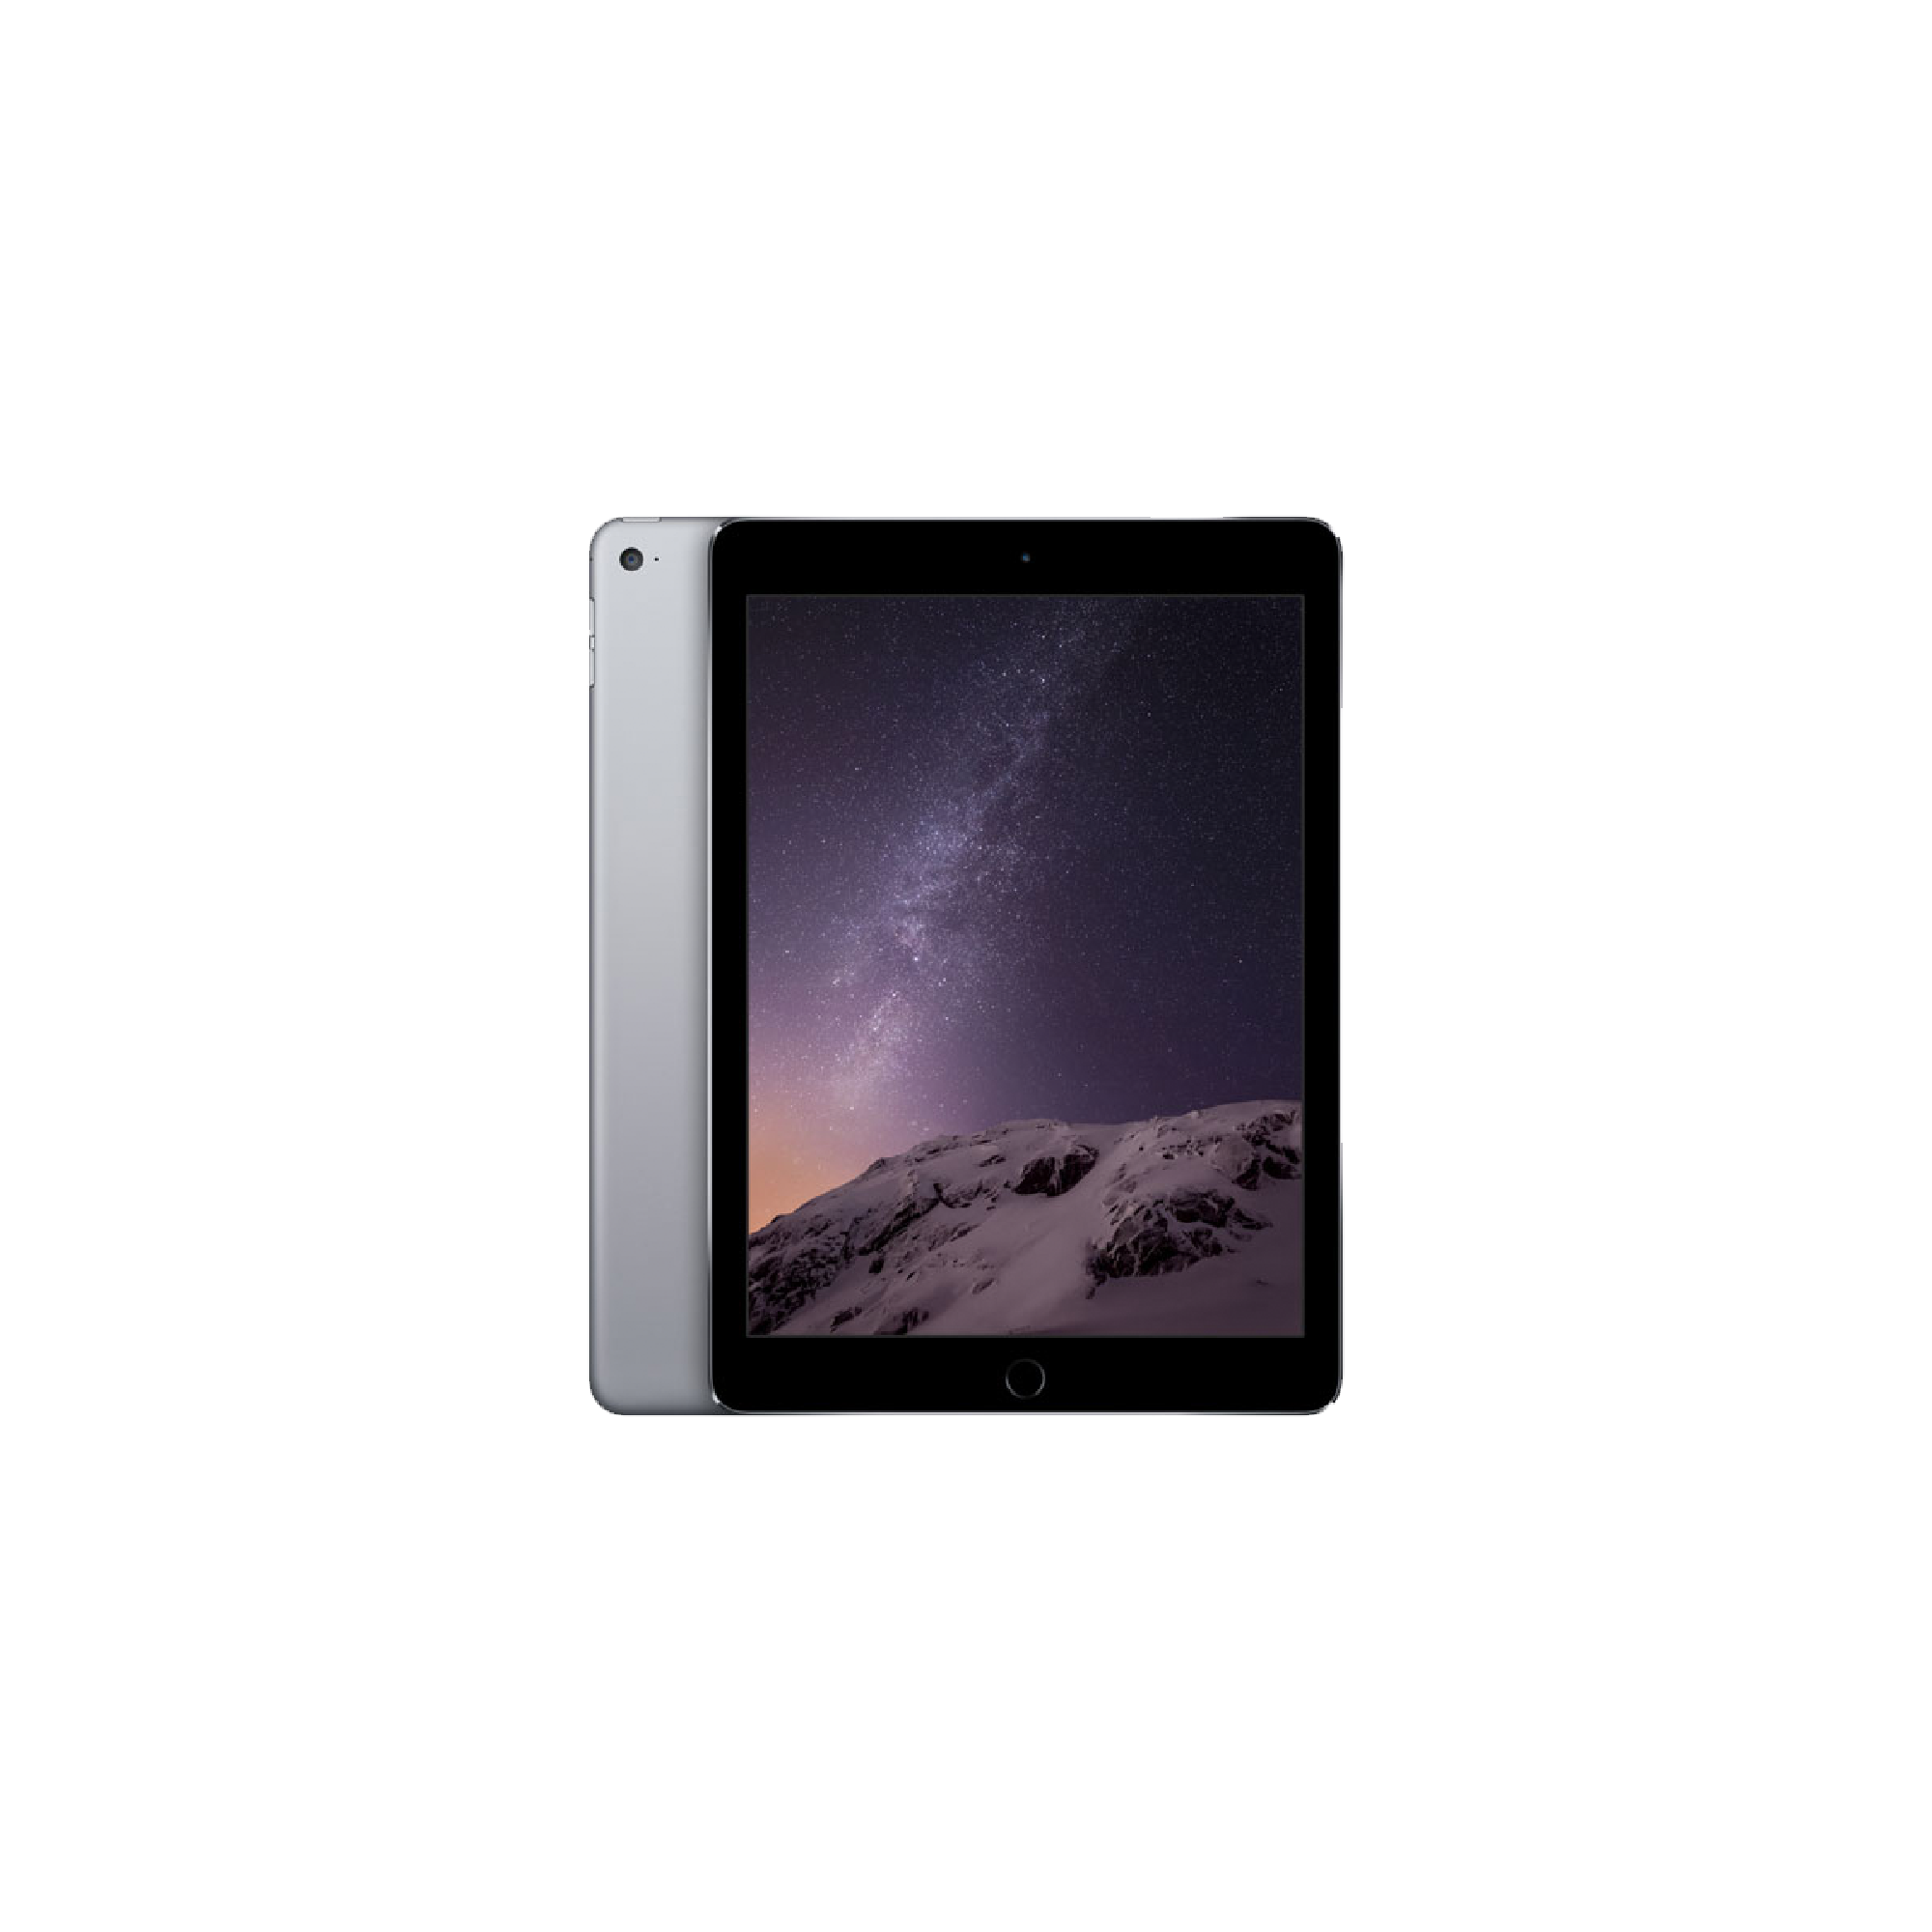 iPad Air 2  | $220 + tax